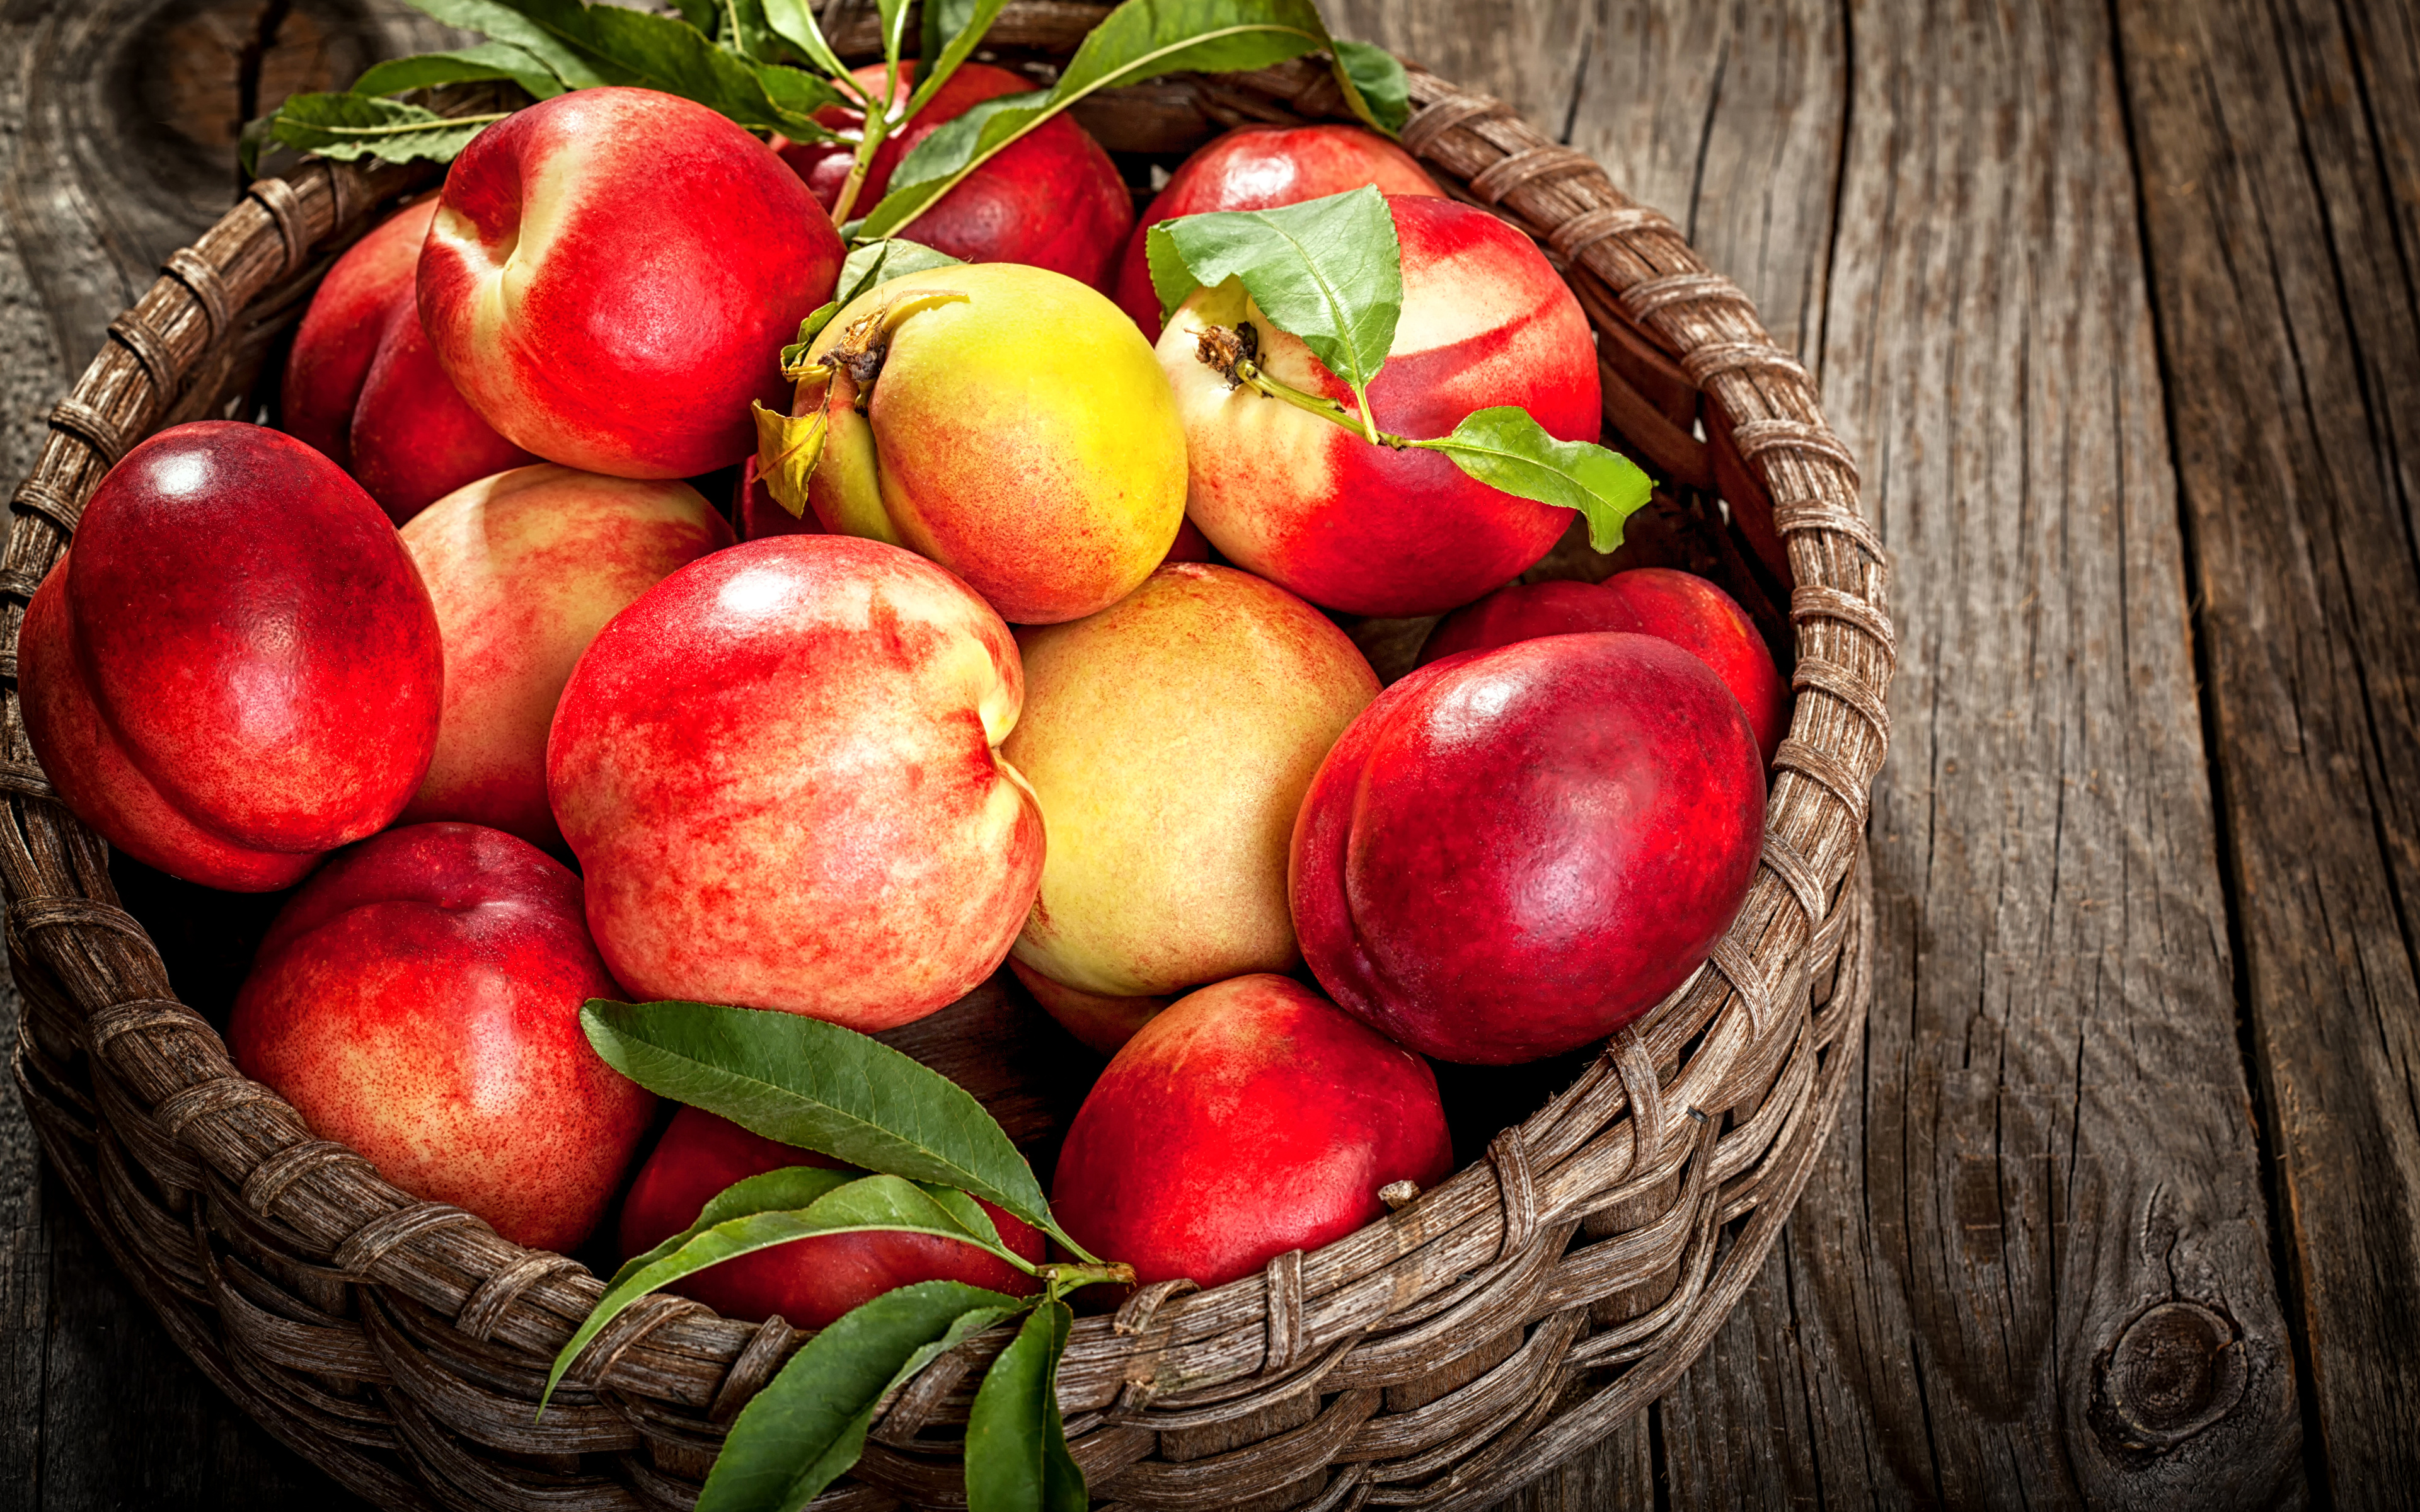 Fruit_Peaches_Wicker_495380_3840x2400